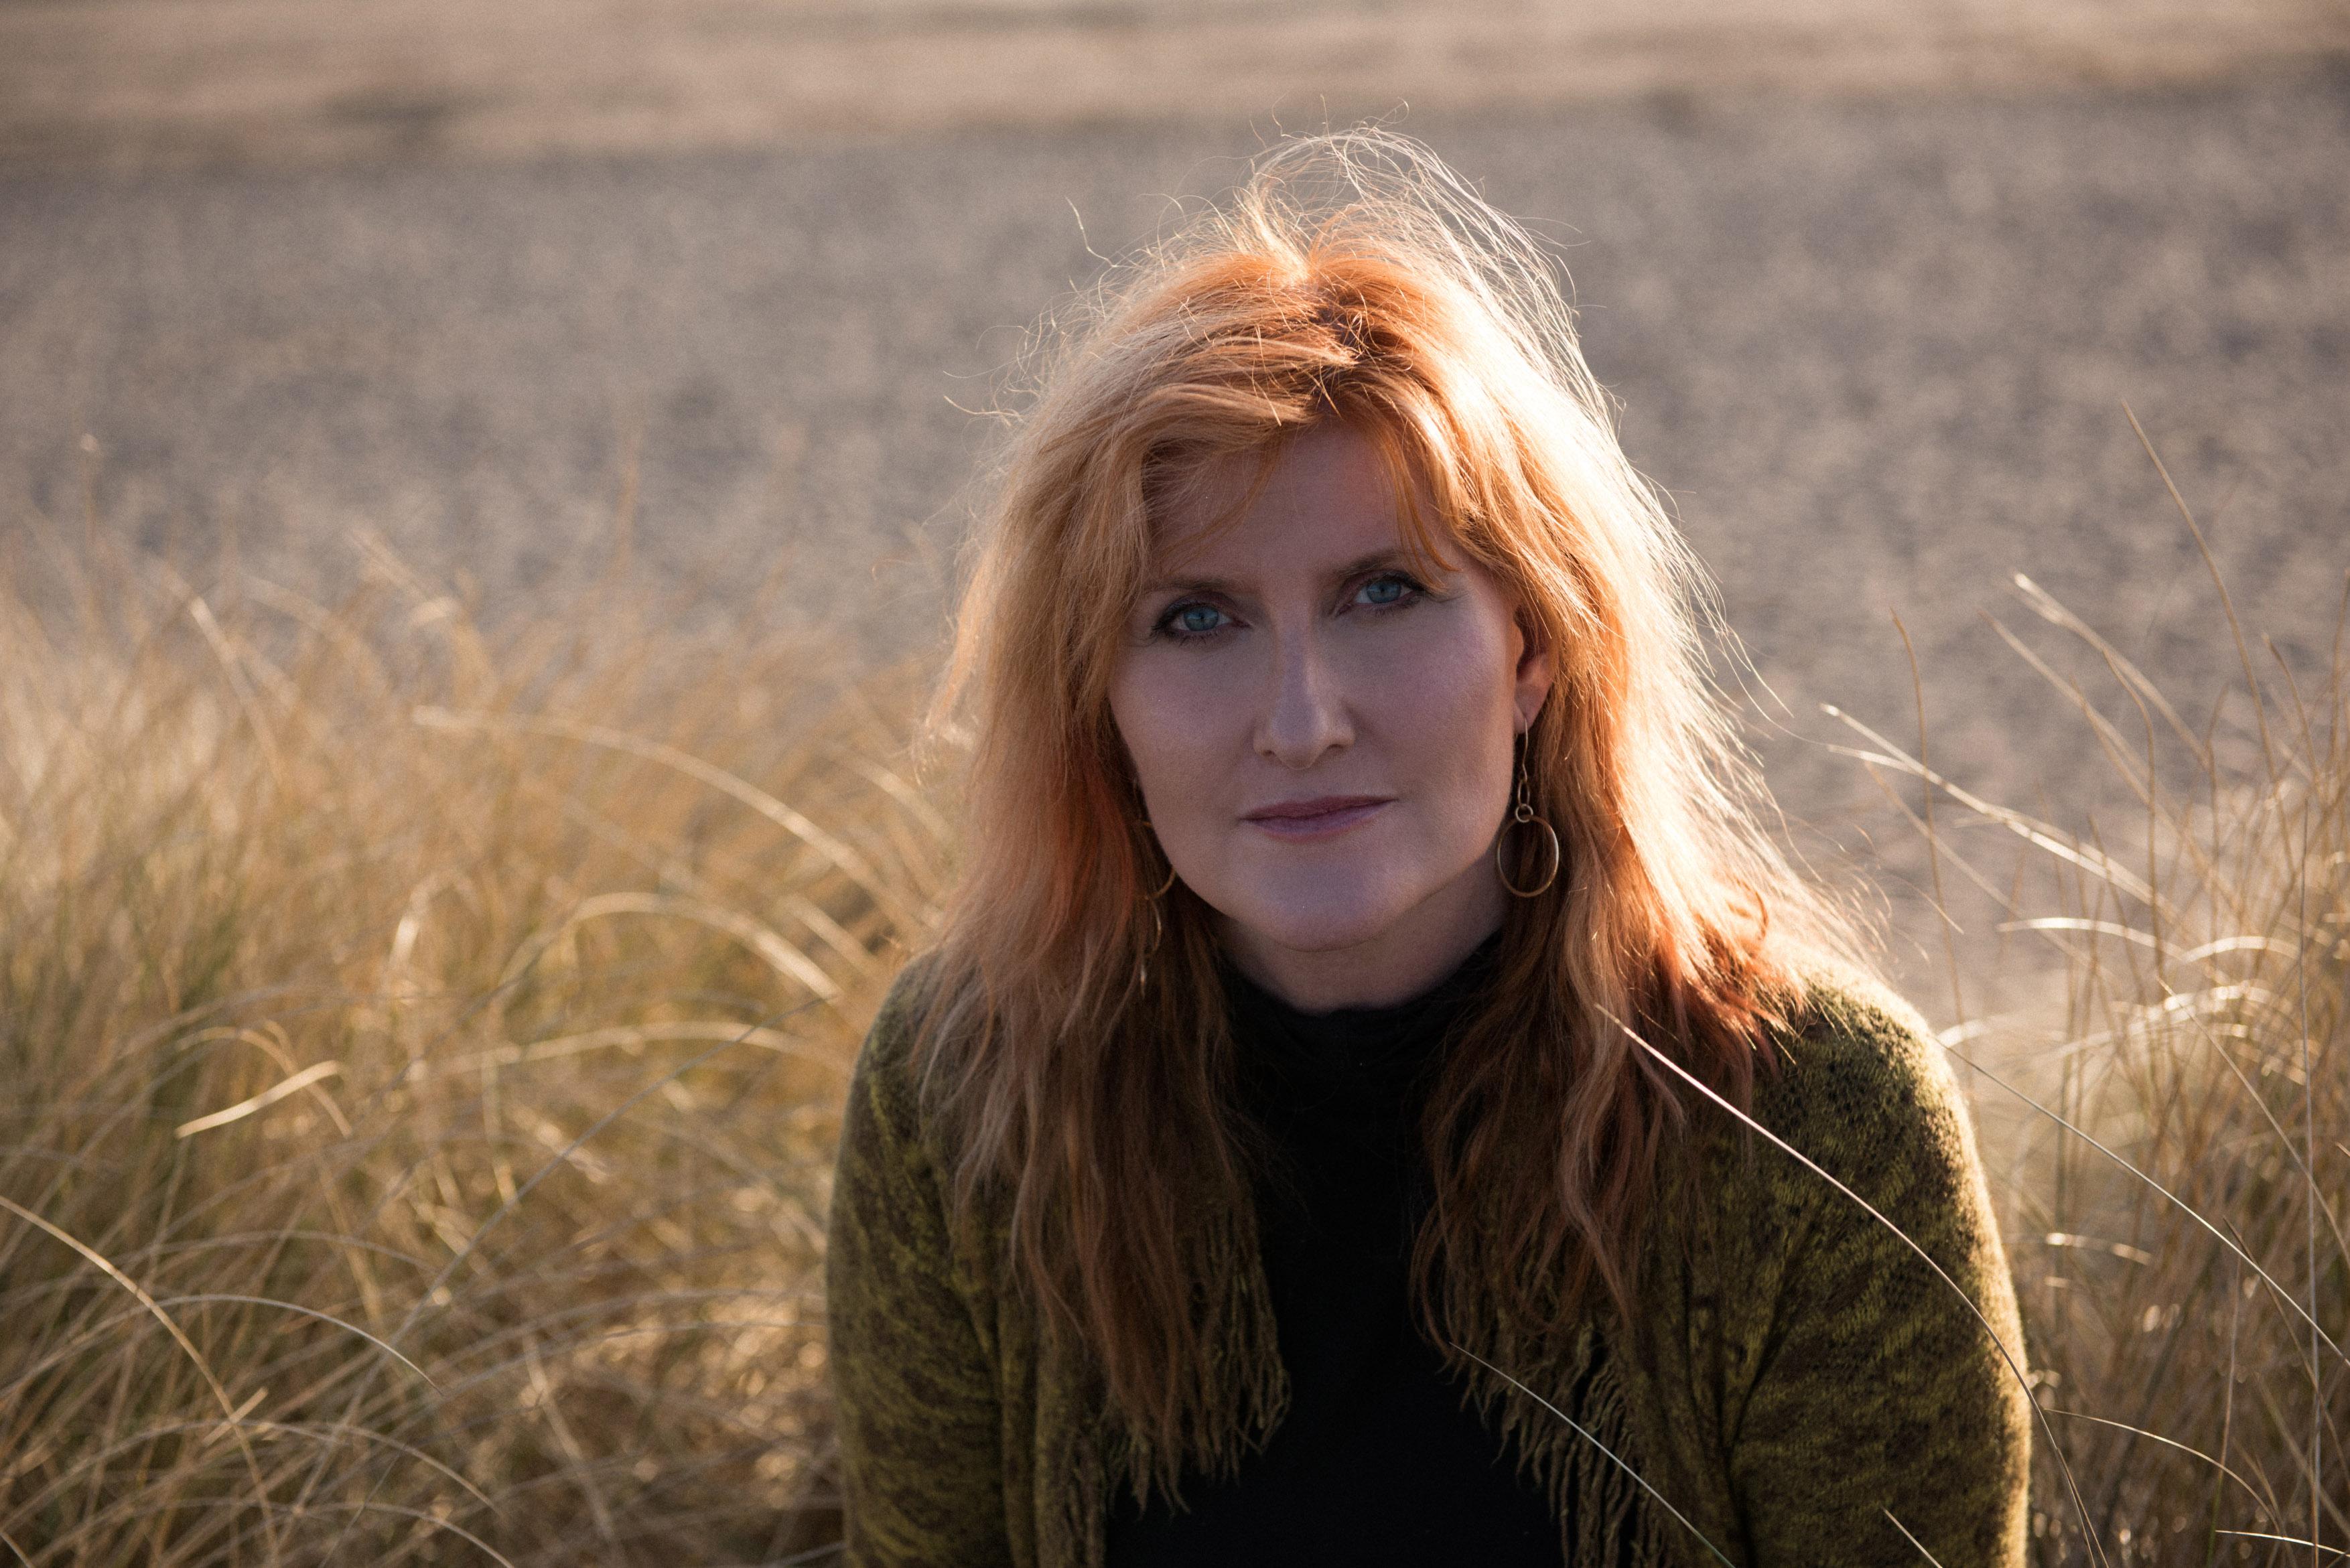 Eddi Reader is heading to Rewind Festival (Genevieve Stevenson)